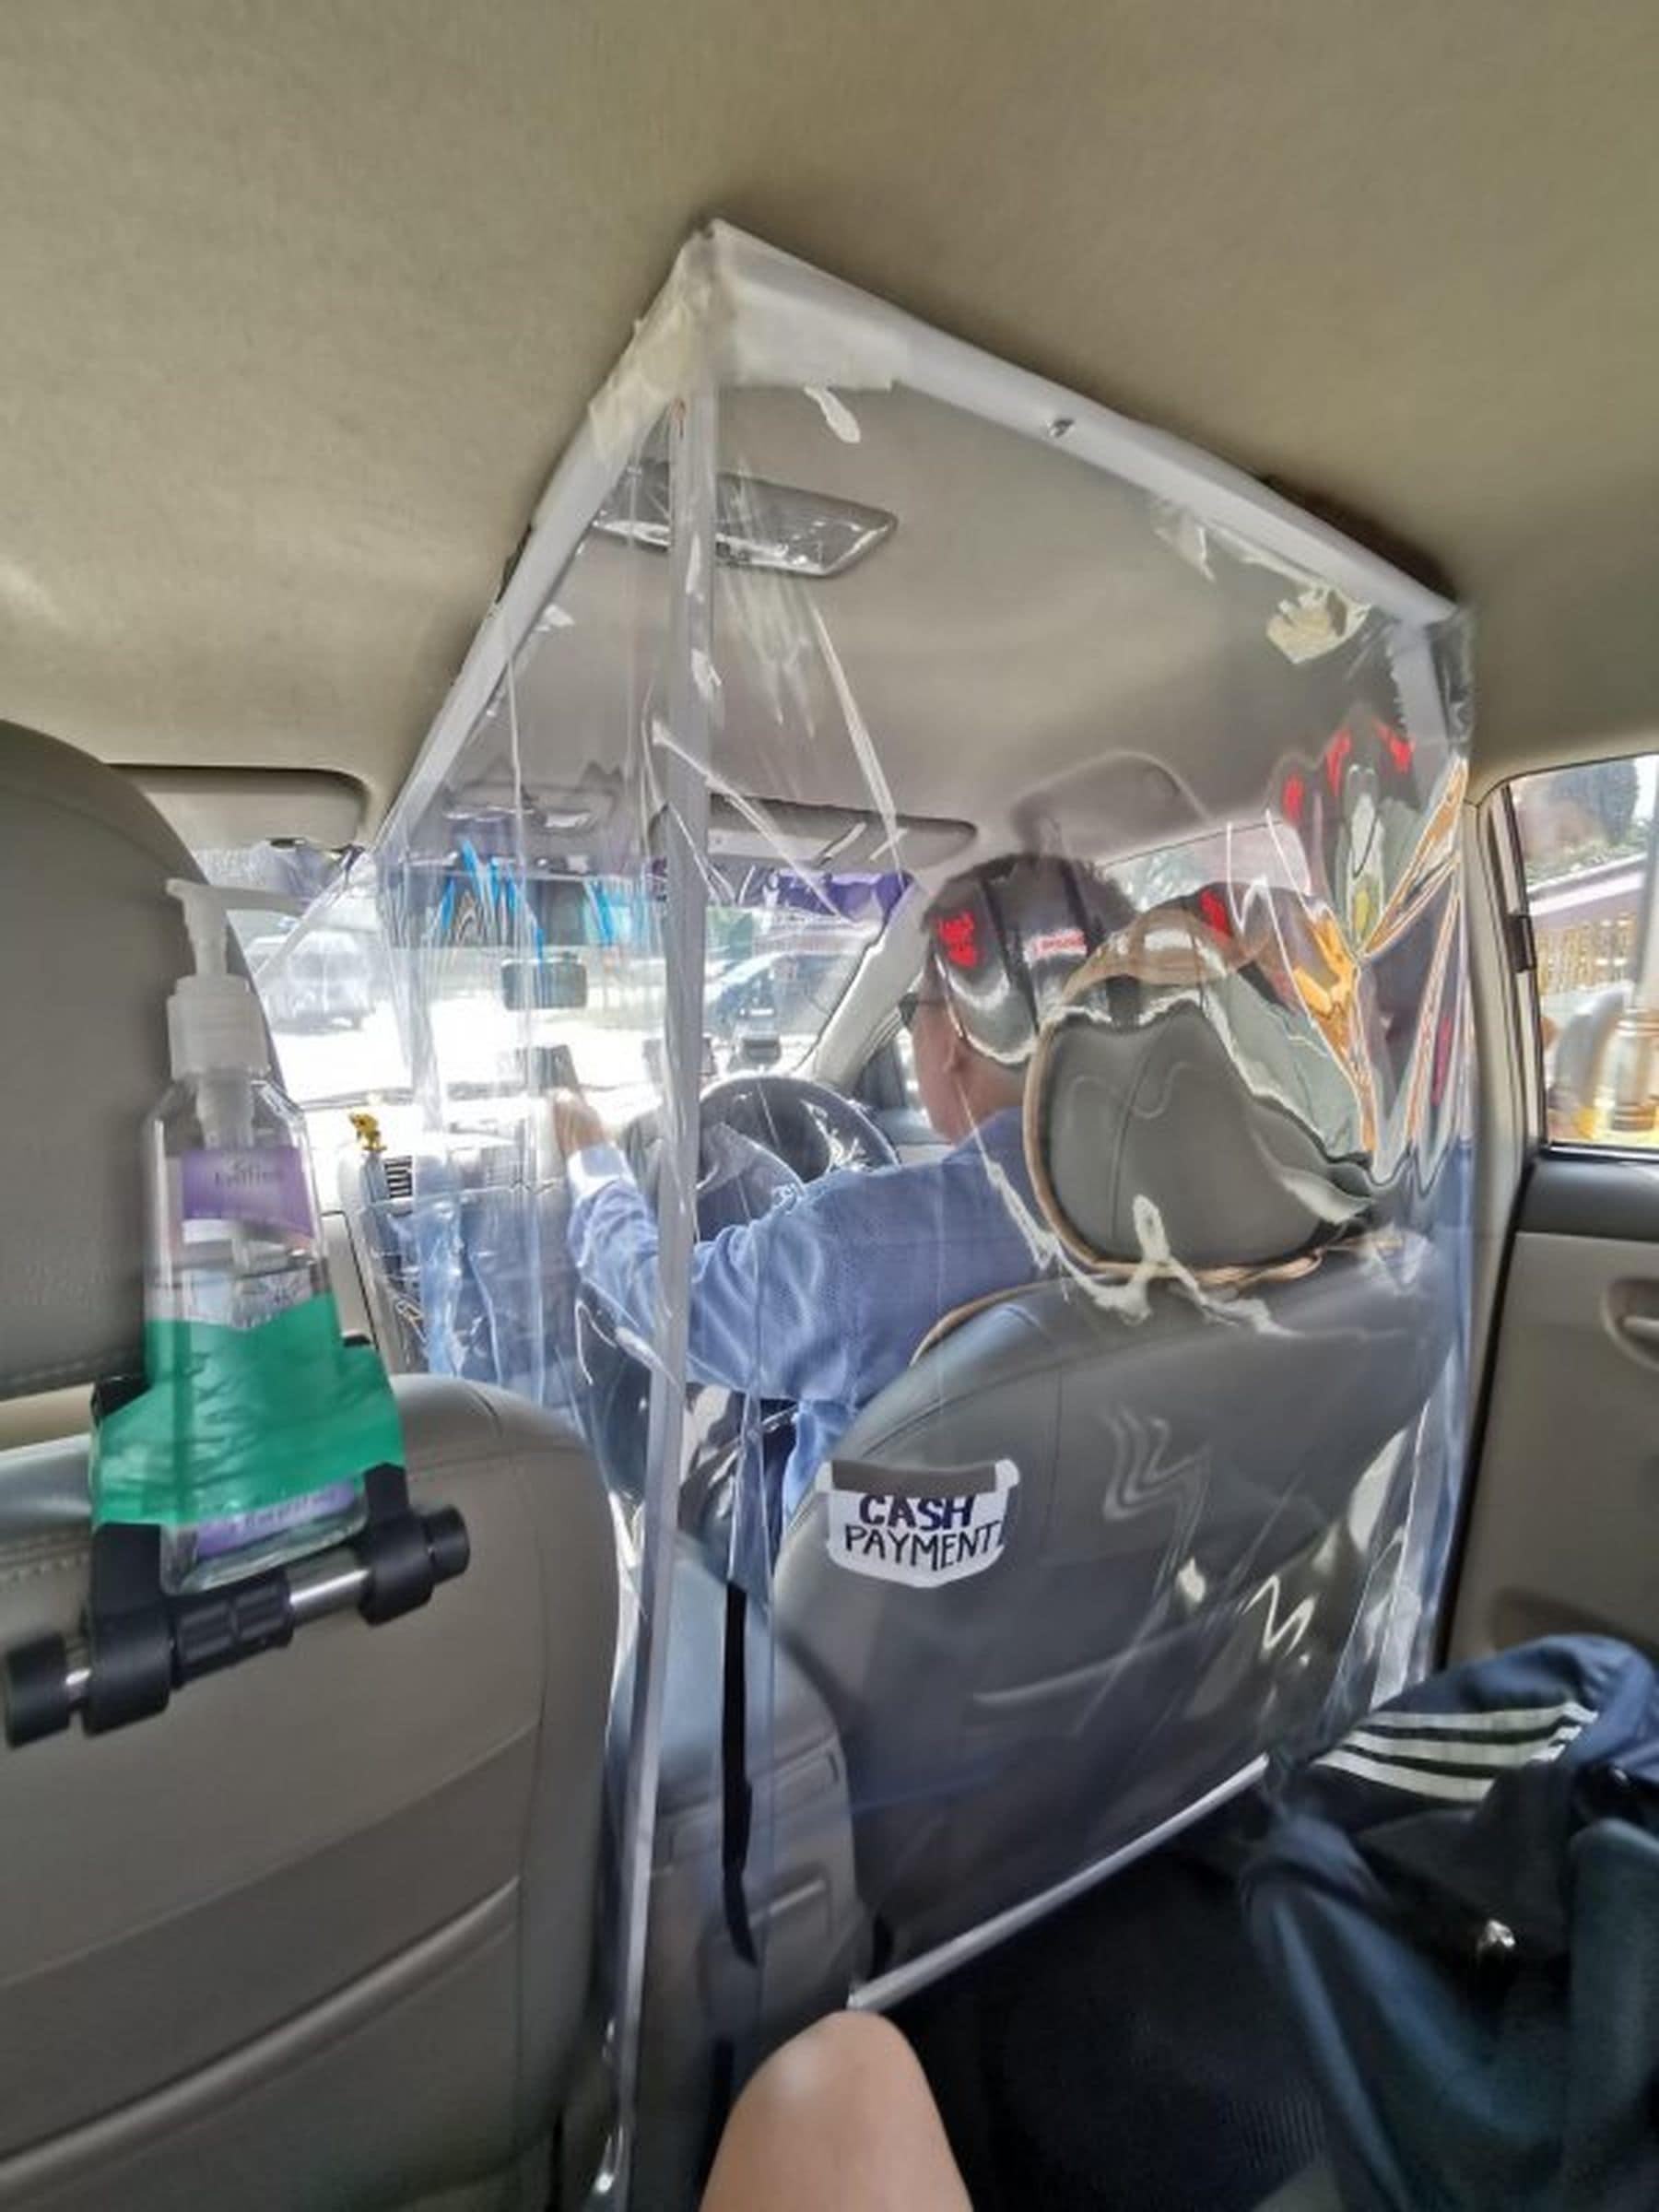 Taxi-Fahren in Corona-Zeiten | Lustiges | Was is hier eigentlich los?